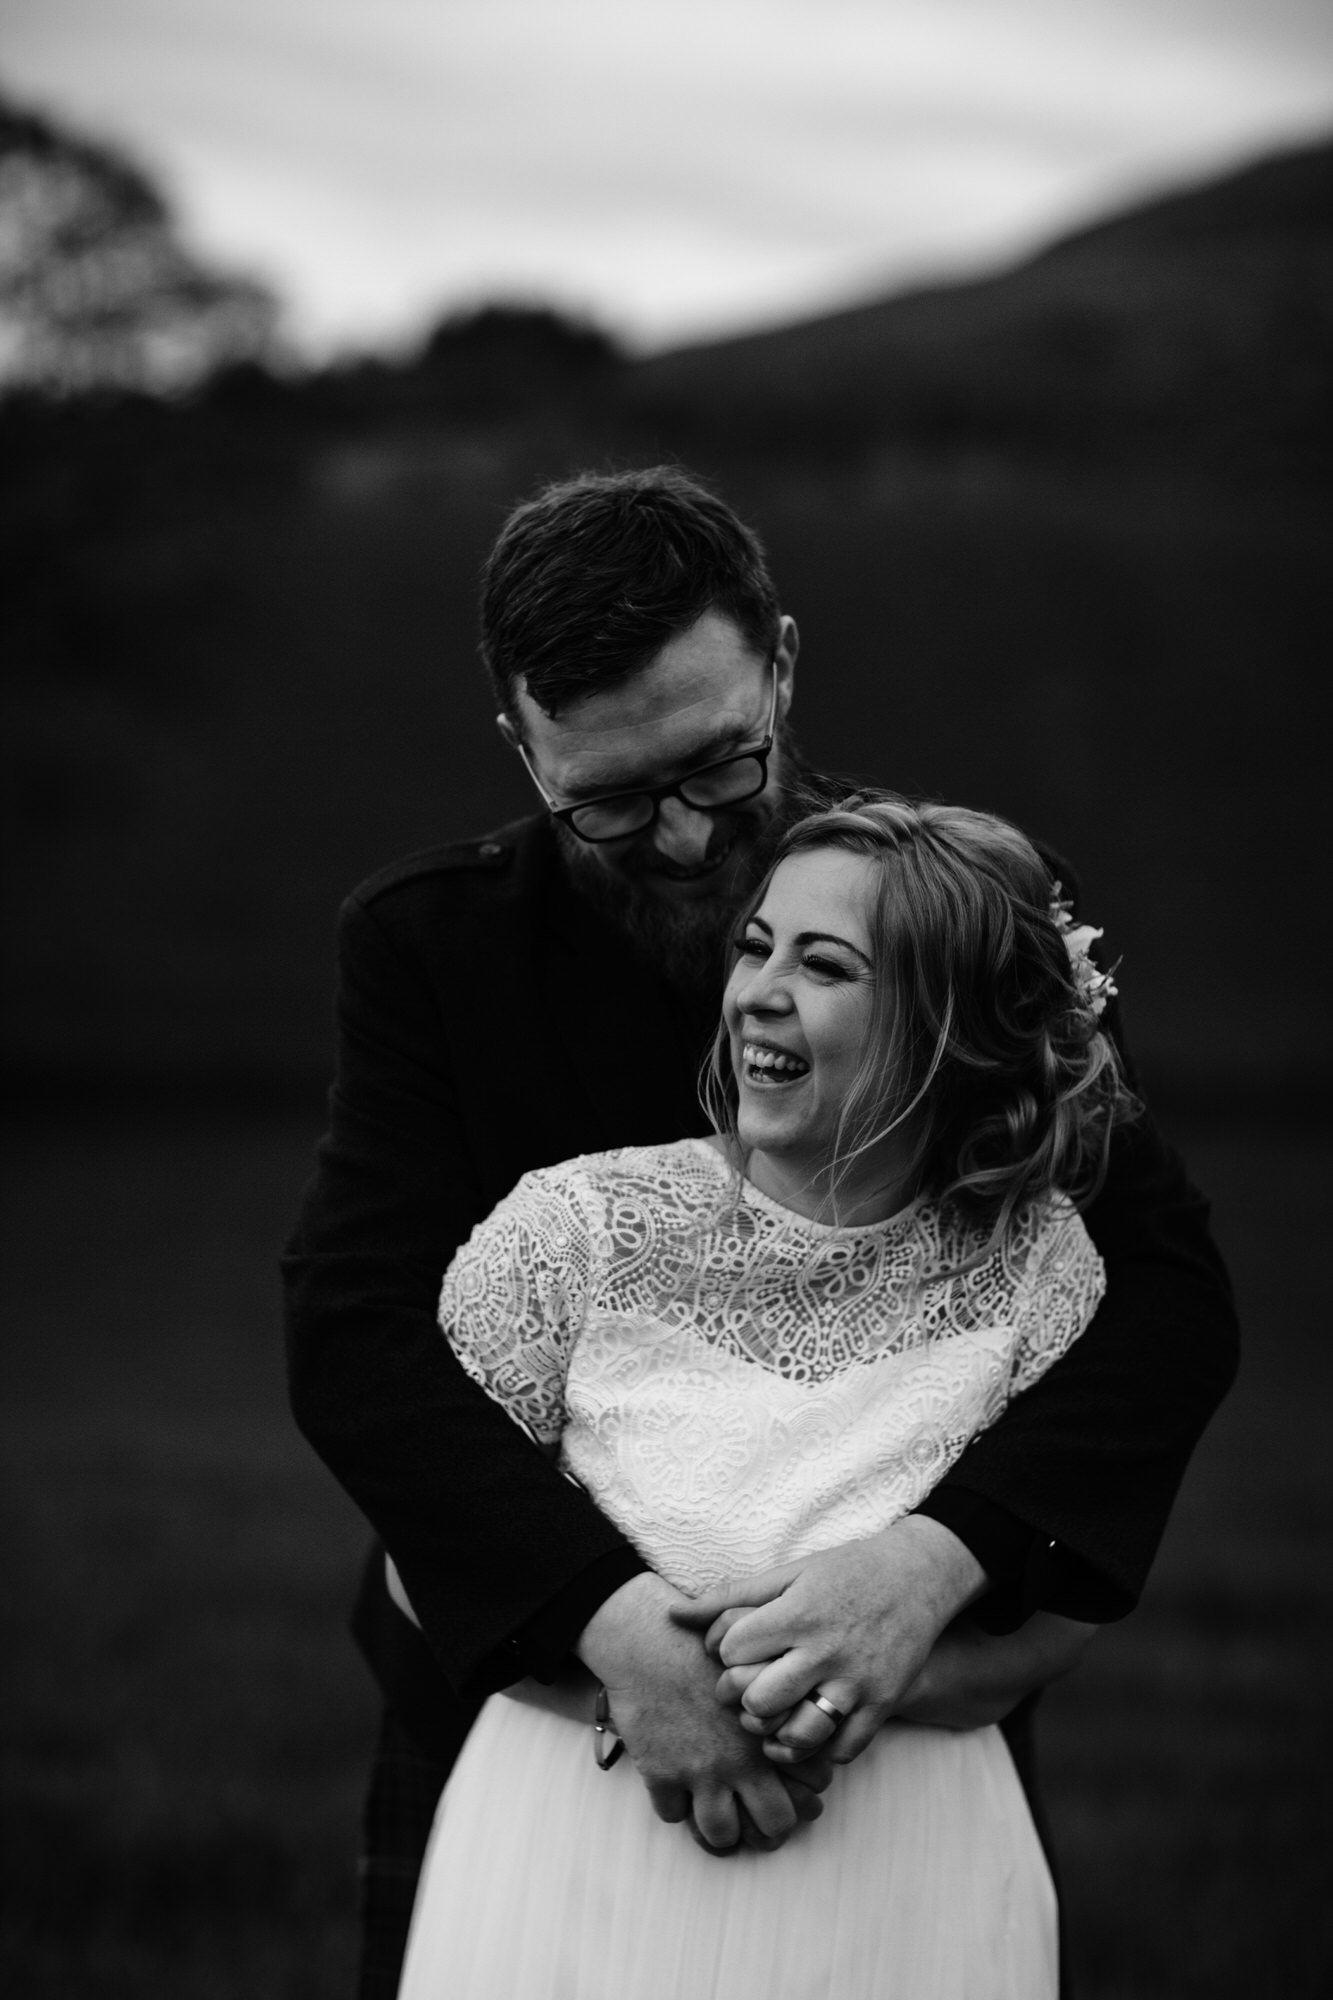 068 TIN SHED KNOCKRAICH WEDDING AUSTRIAN SCOTTISH ZOE ALEXANDRA PHOTOGRAPHY